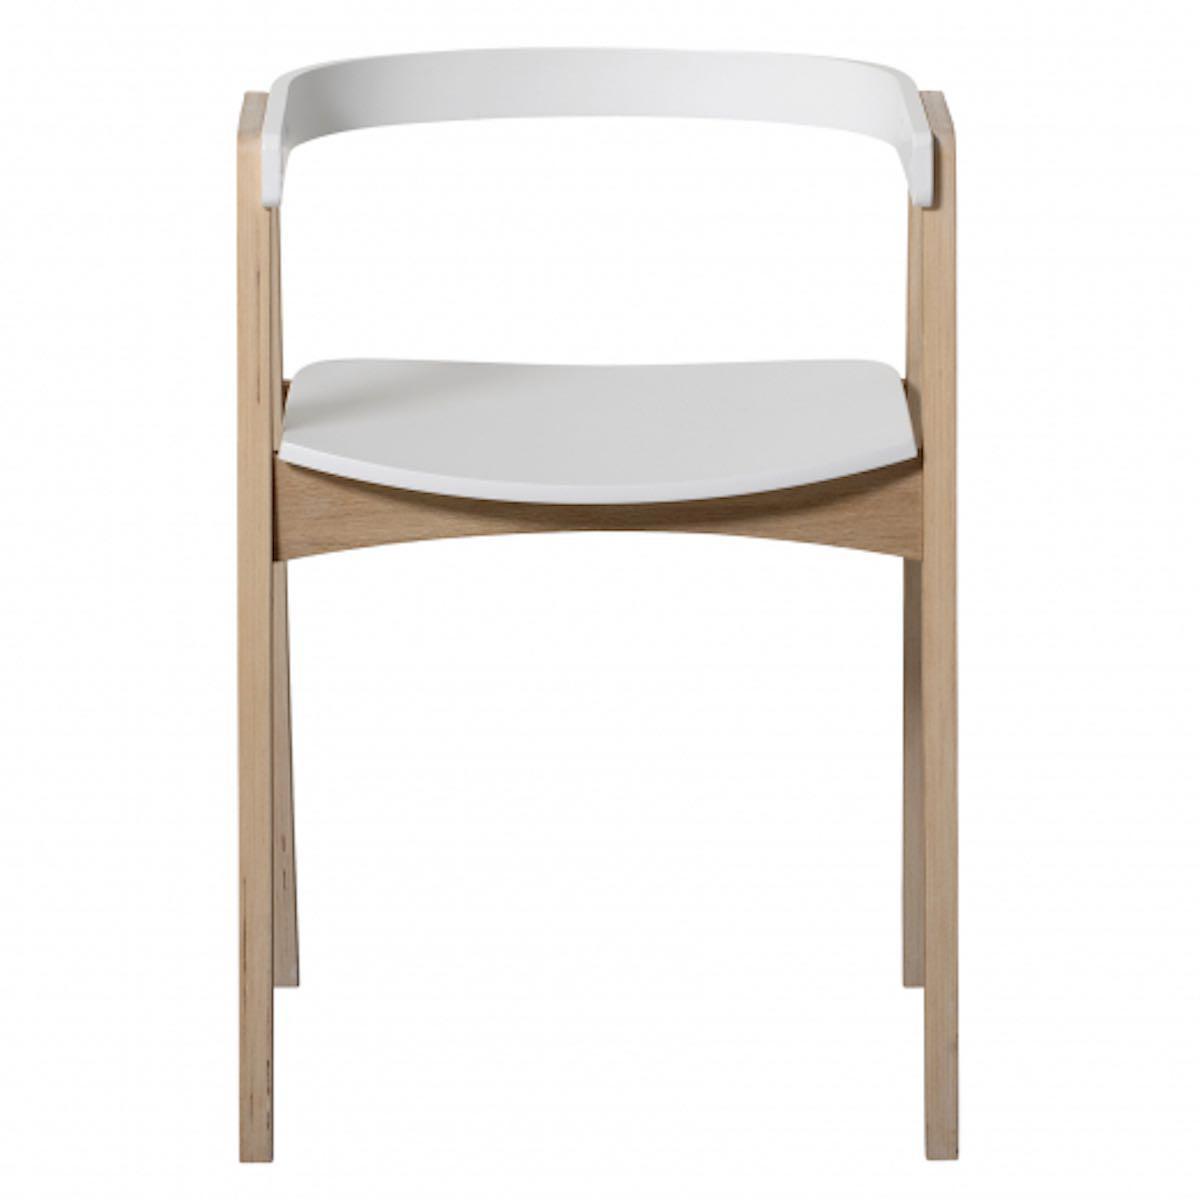 Silla WOOD Oliver Furniture blanco-roble